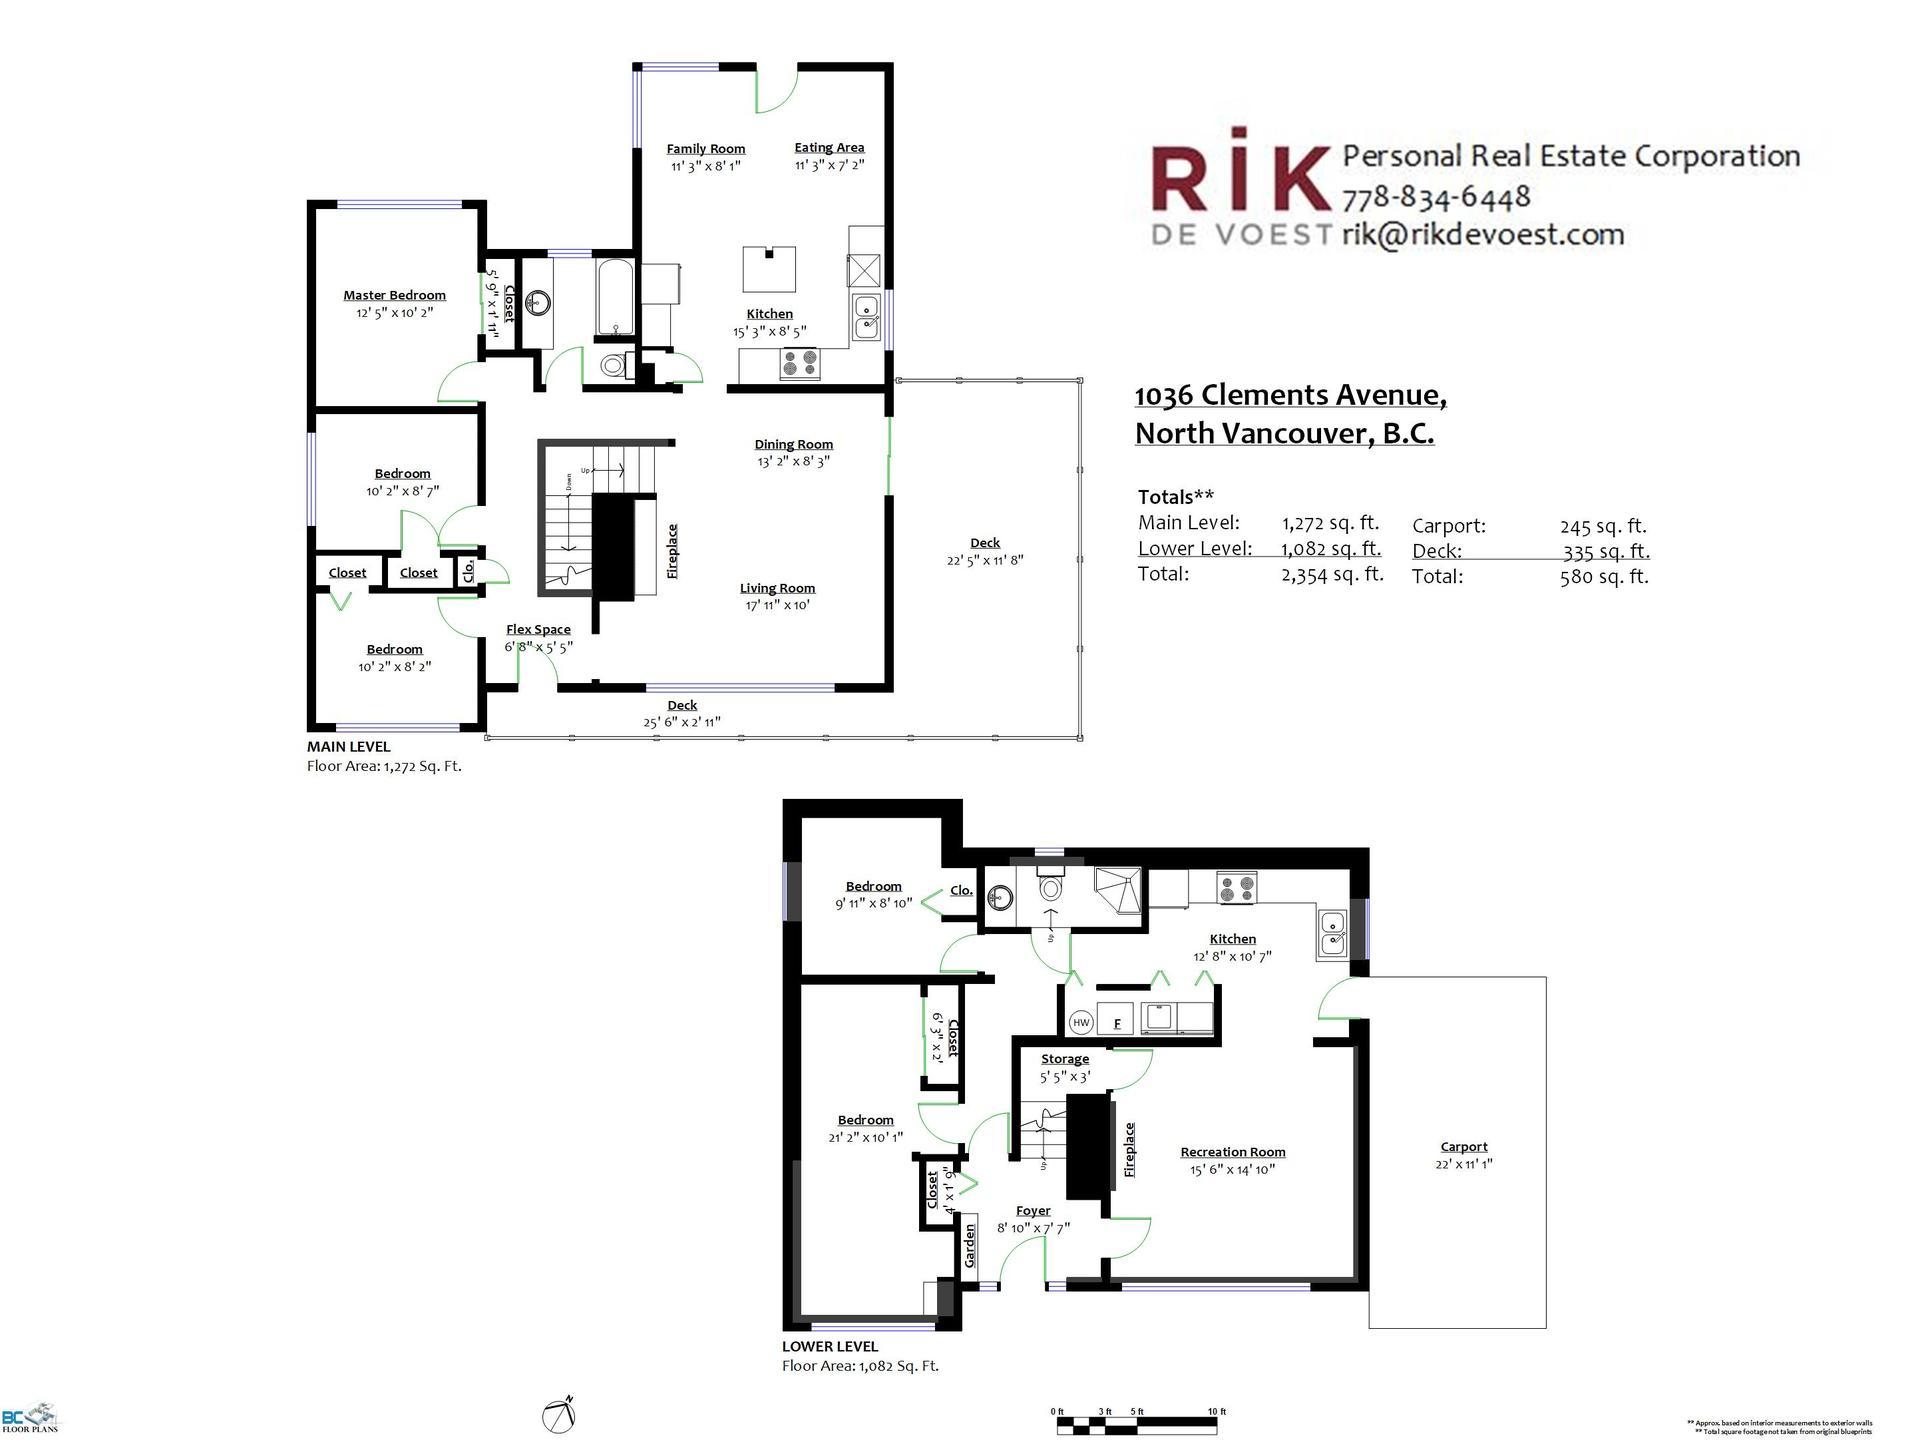 floorplan-1036-clements-avenue-north-vancouver-branded at 1036 Clements, Canyon Heights NV, North Vancouver